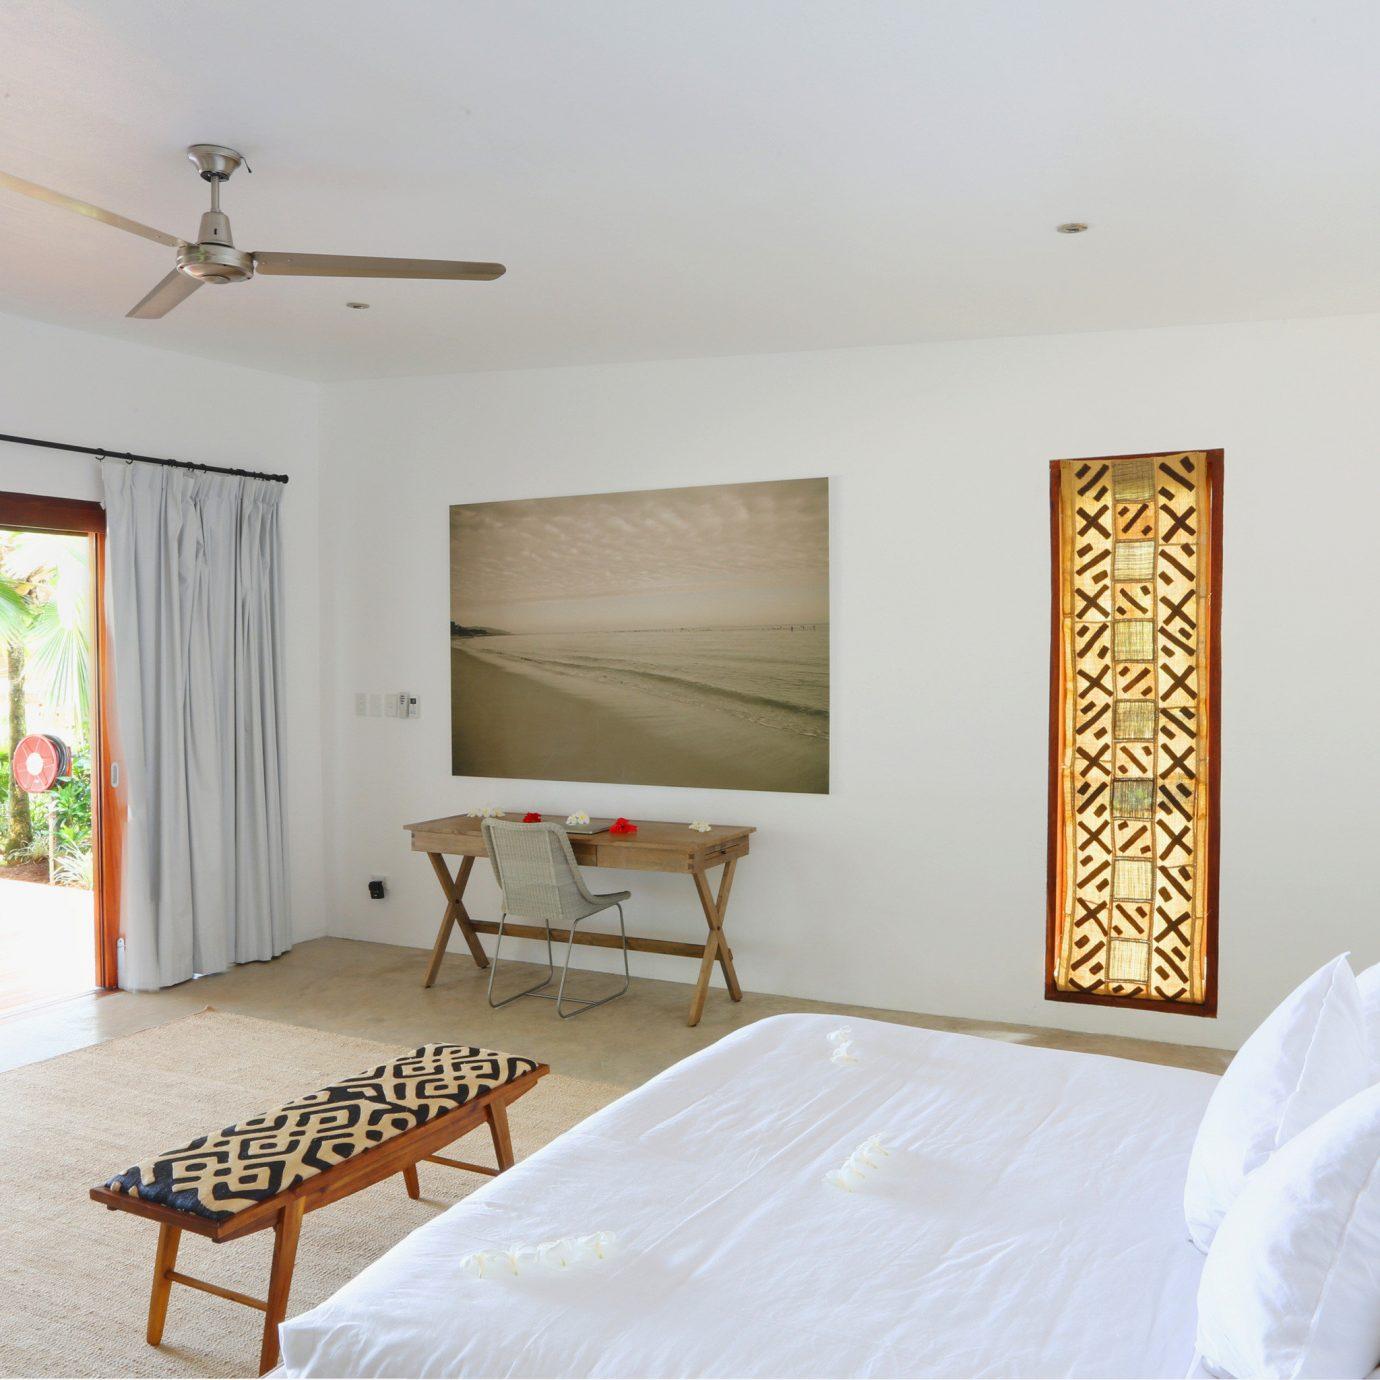 All-inclusive Beachfront Bedroom Honeymoon Resort Romance Romantic Waterfront property home cottage living room